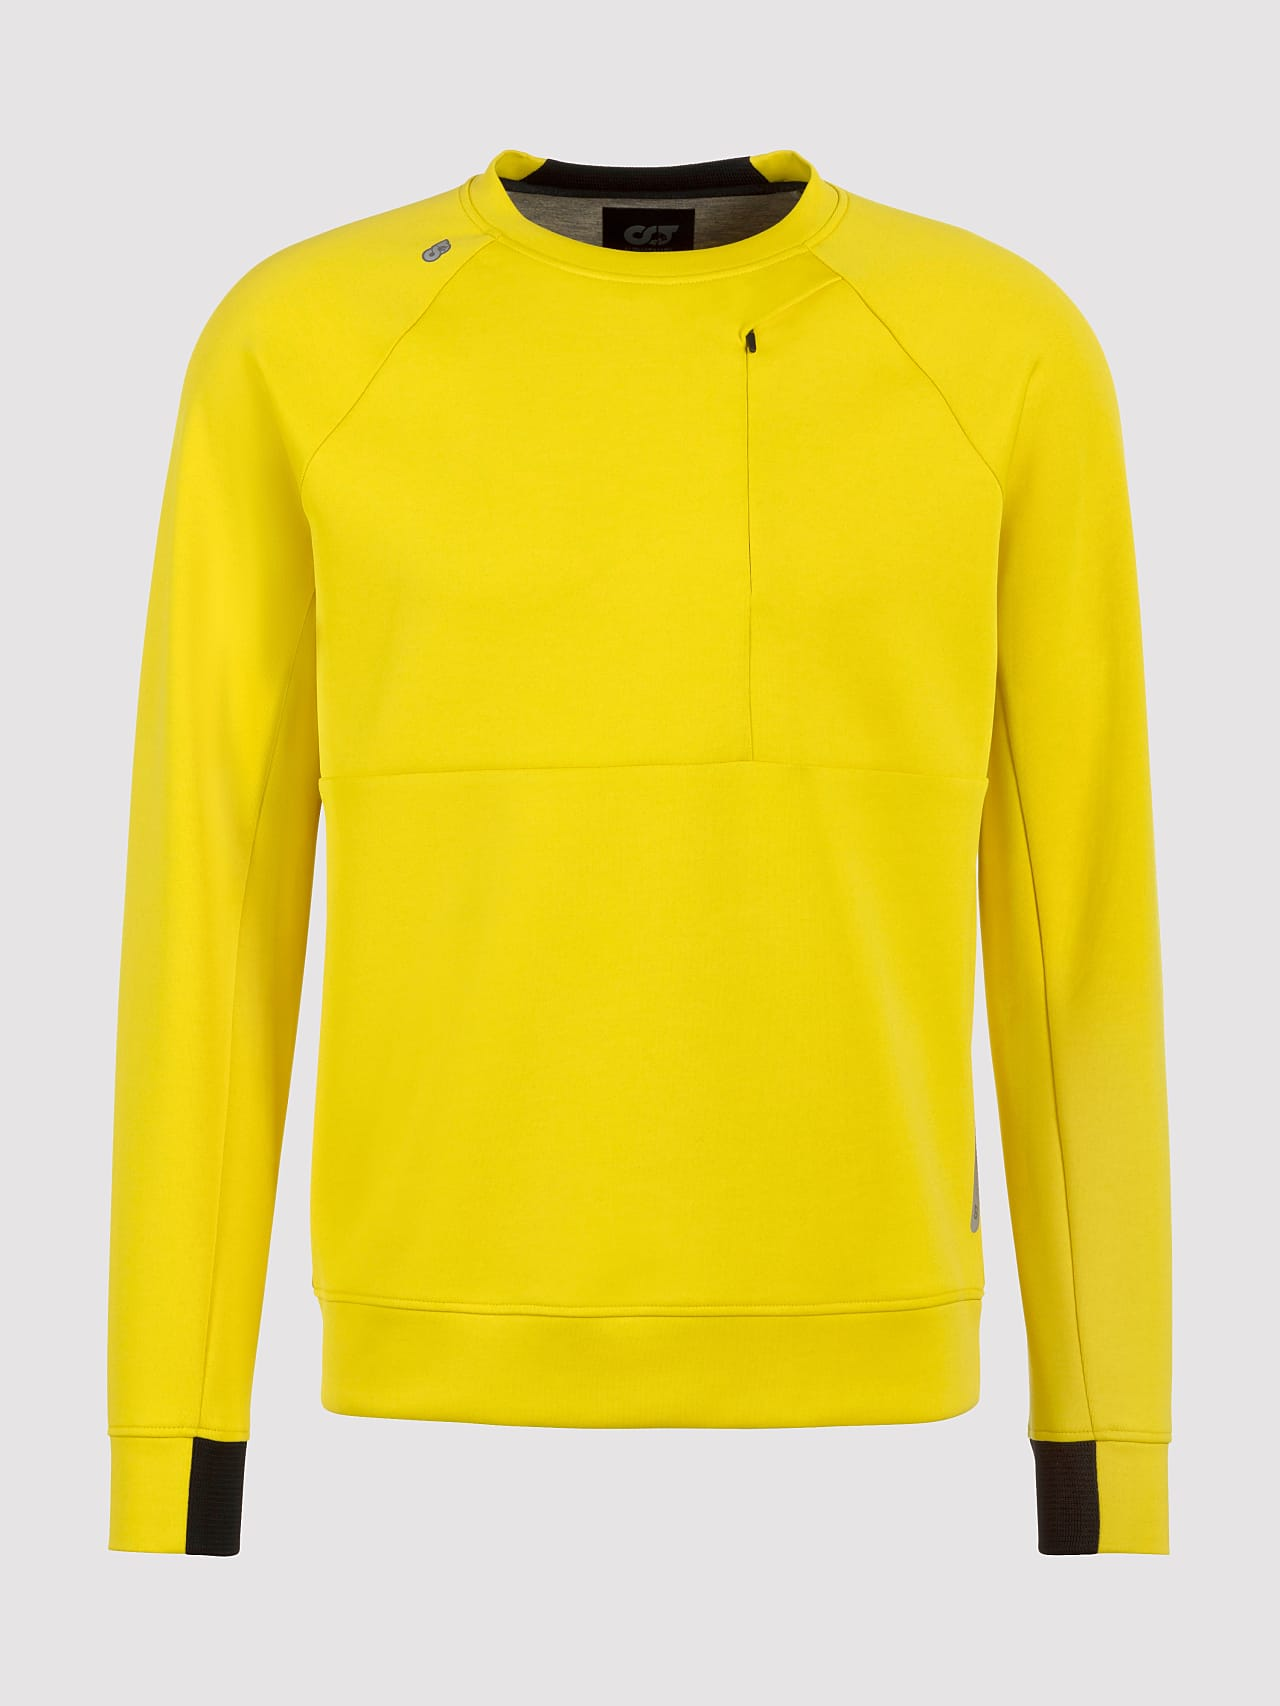 SUPRA V3.Y5.01 Technical Crewneck Sweater yellow Back Alpha Tauri